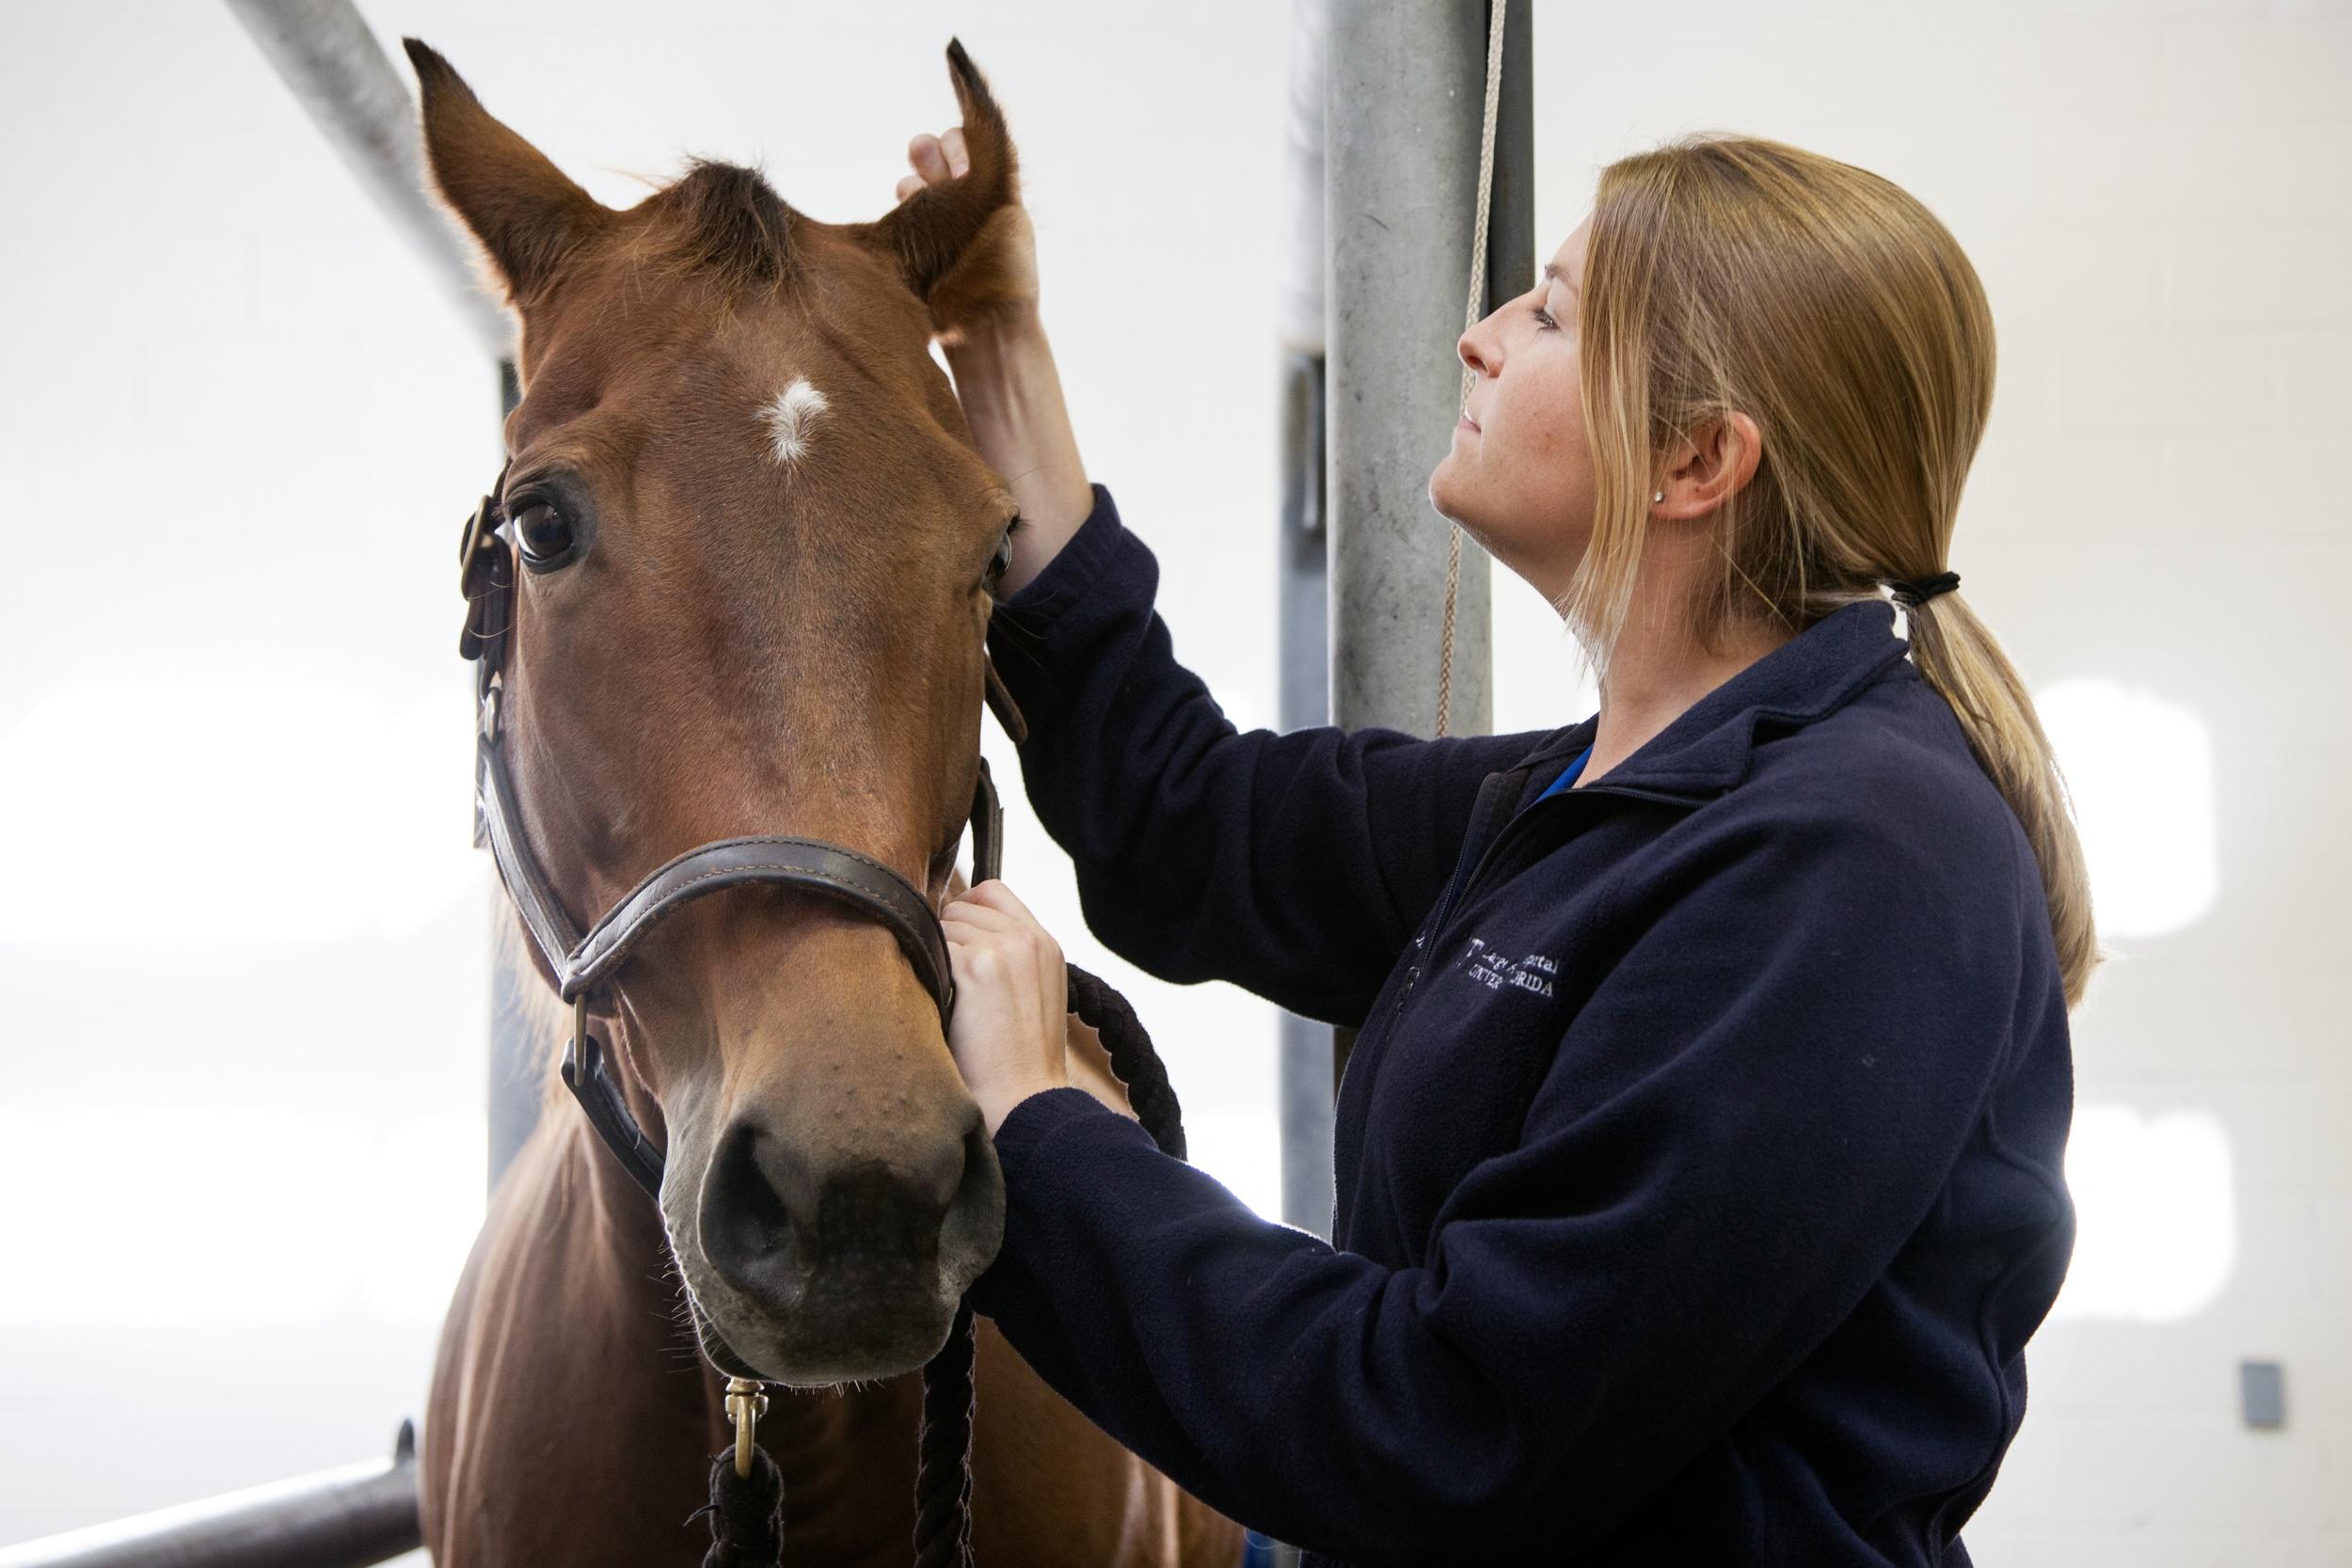 medical imaging cloud PACS for equine veterinarians